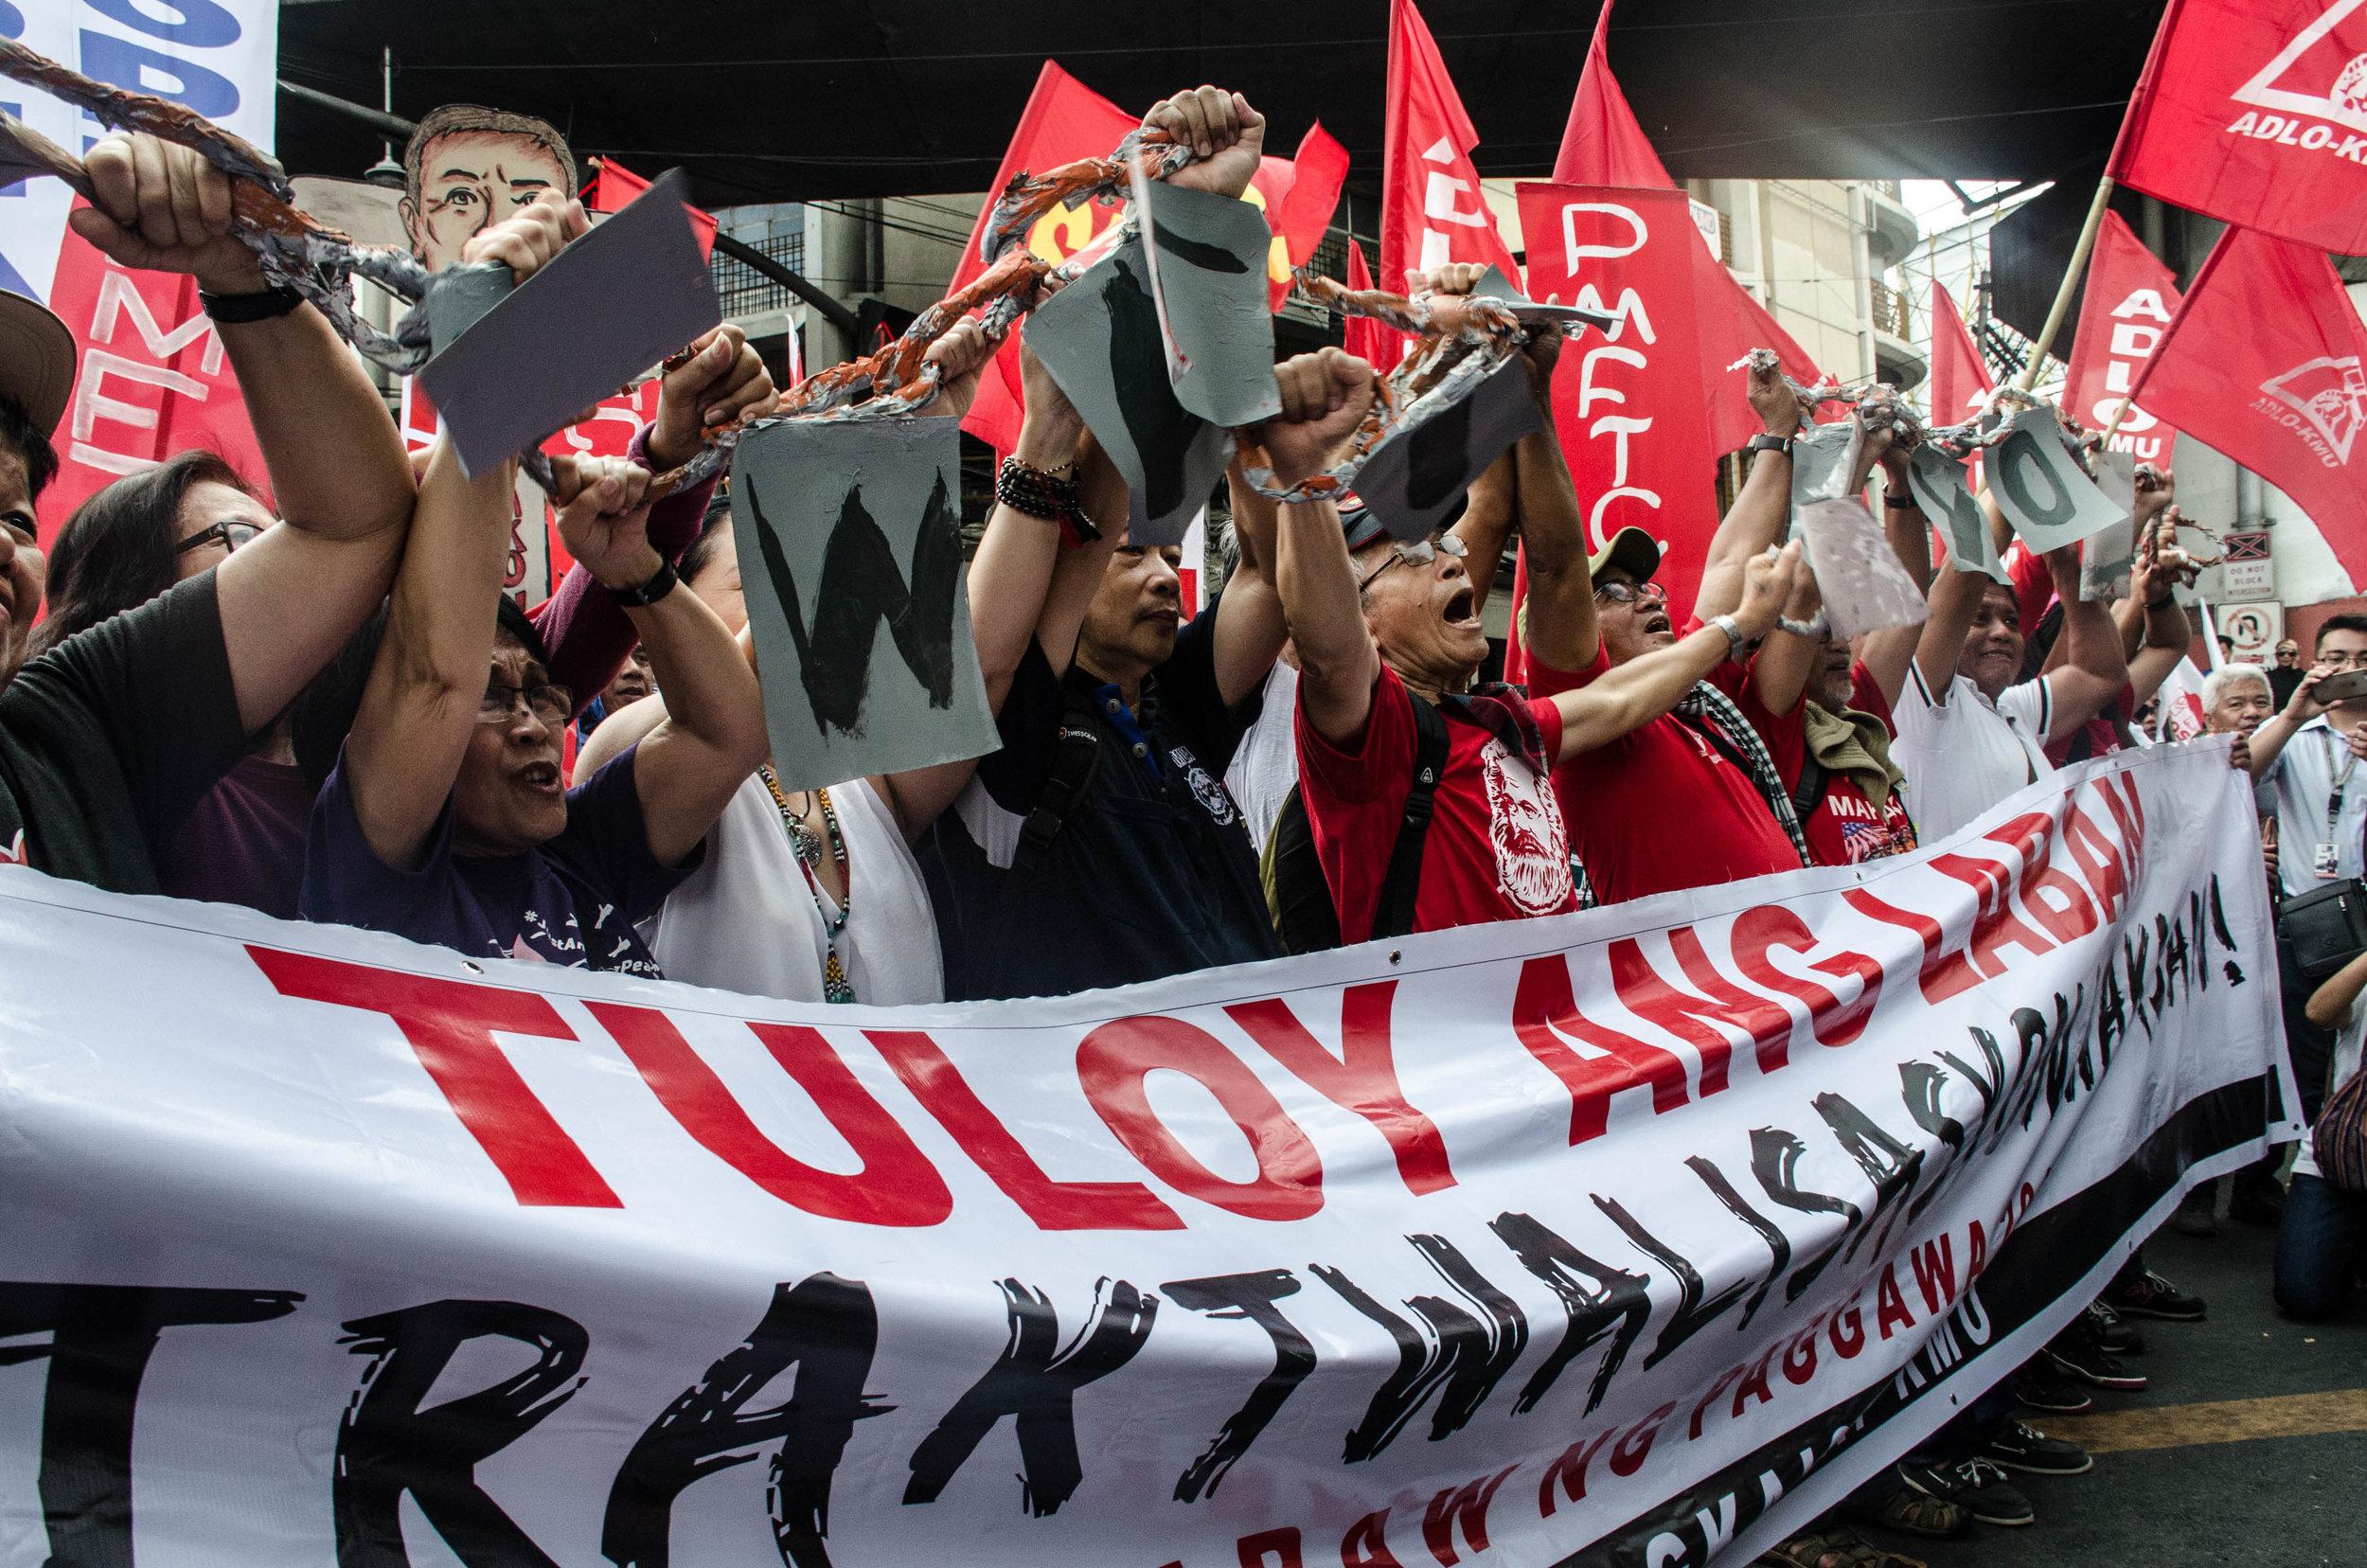 20180501 - Manila - Labor Day Protest-2.jpg